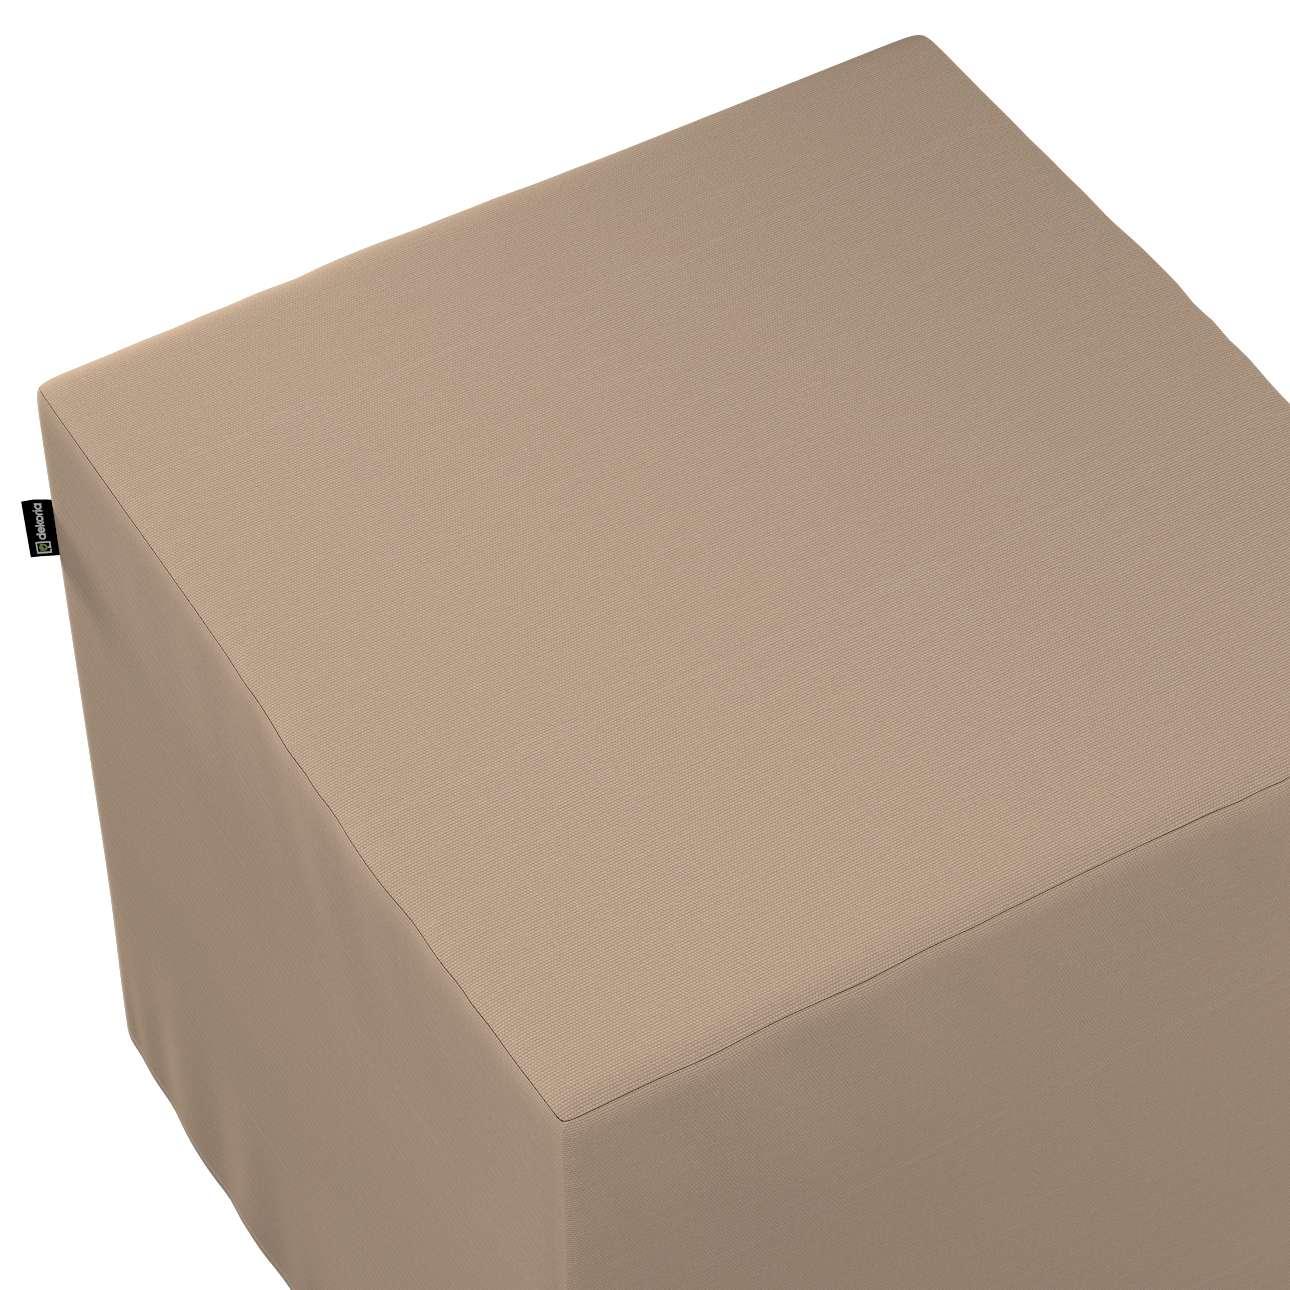 Pufa kostka w kolekcji Cotton Panama, tkanina: 702-28